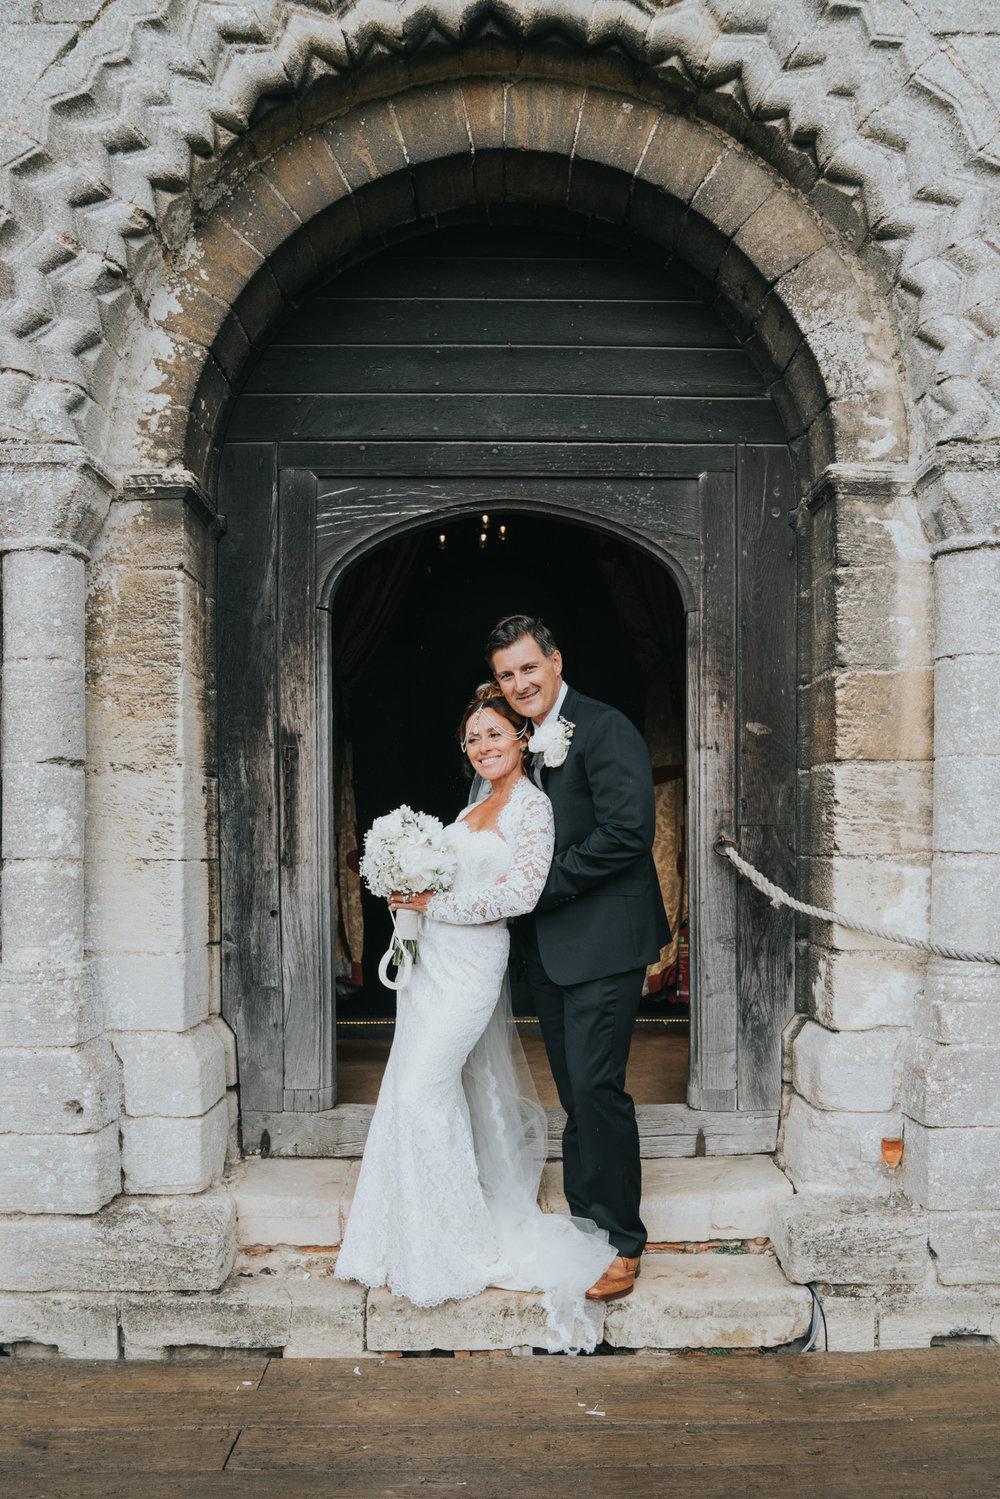 grace-elizabeth-boho-wedding-headingham-castle-essex-wedding-photographer-57.jpg